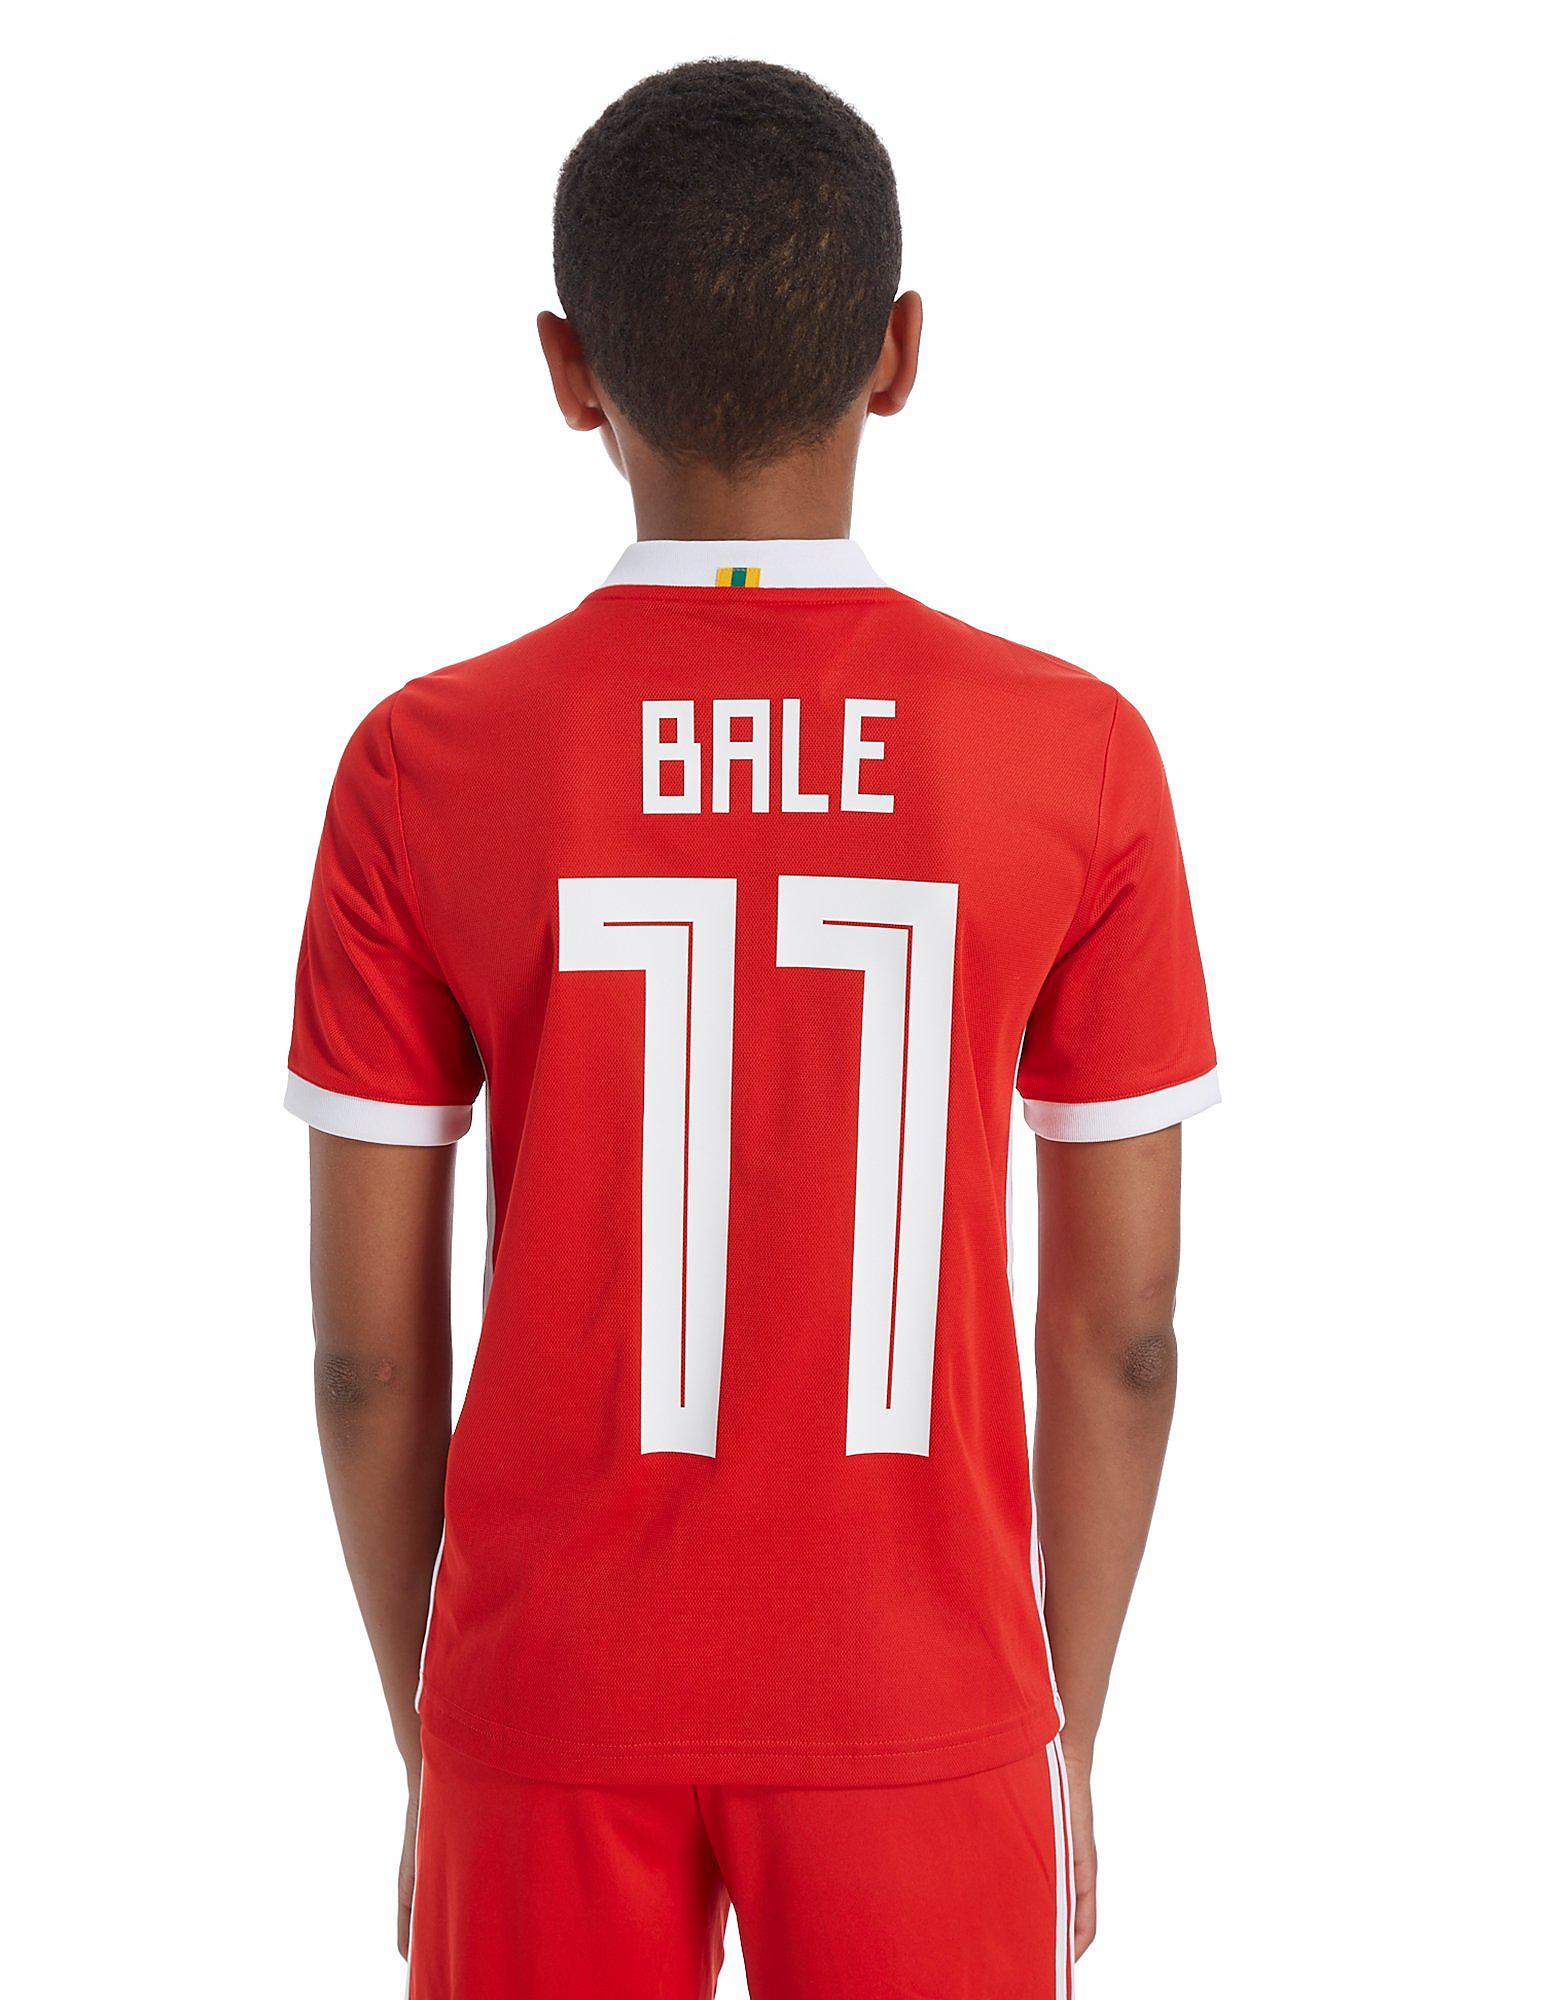 adidas Wales 2018 Home Bale #11 Shirt Junior